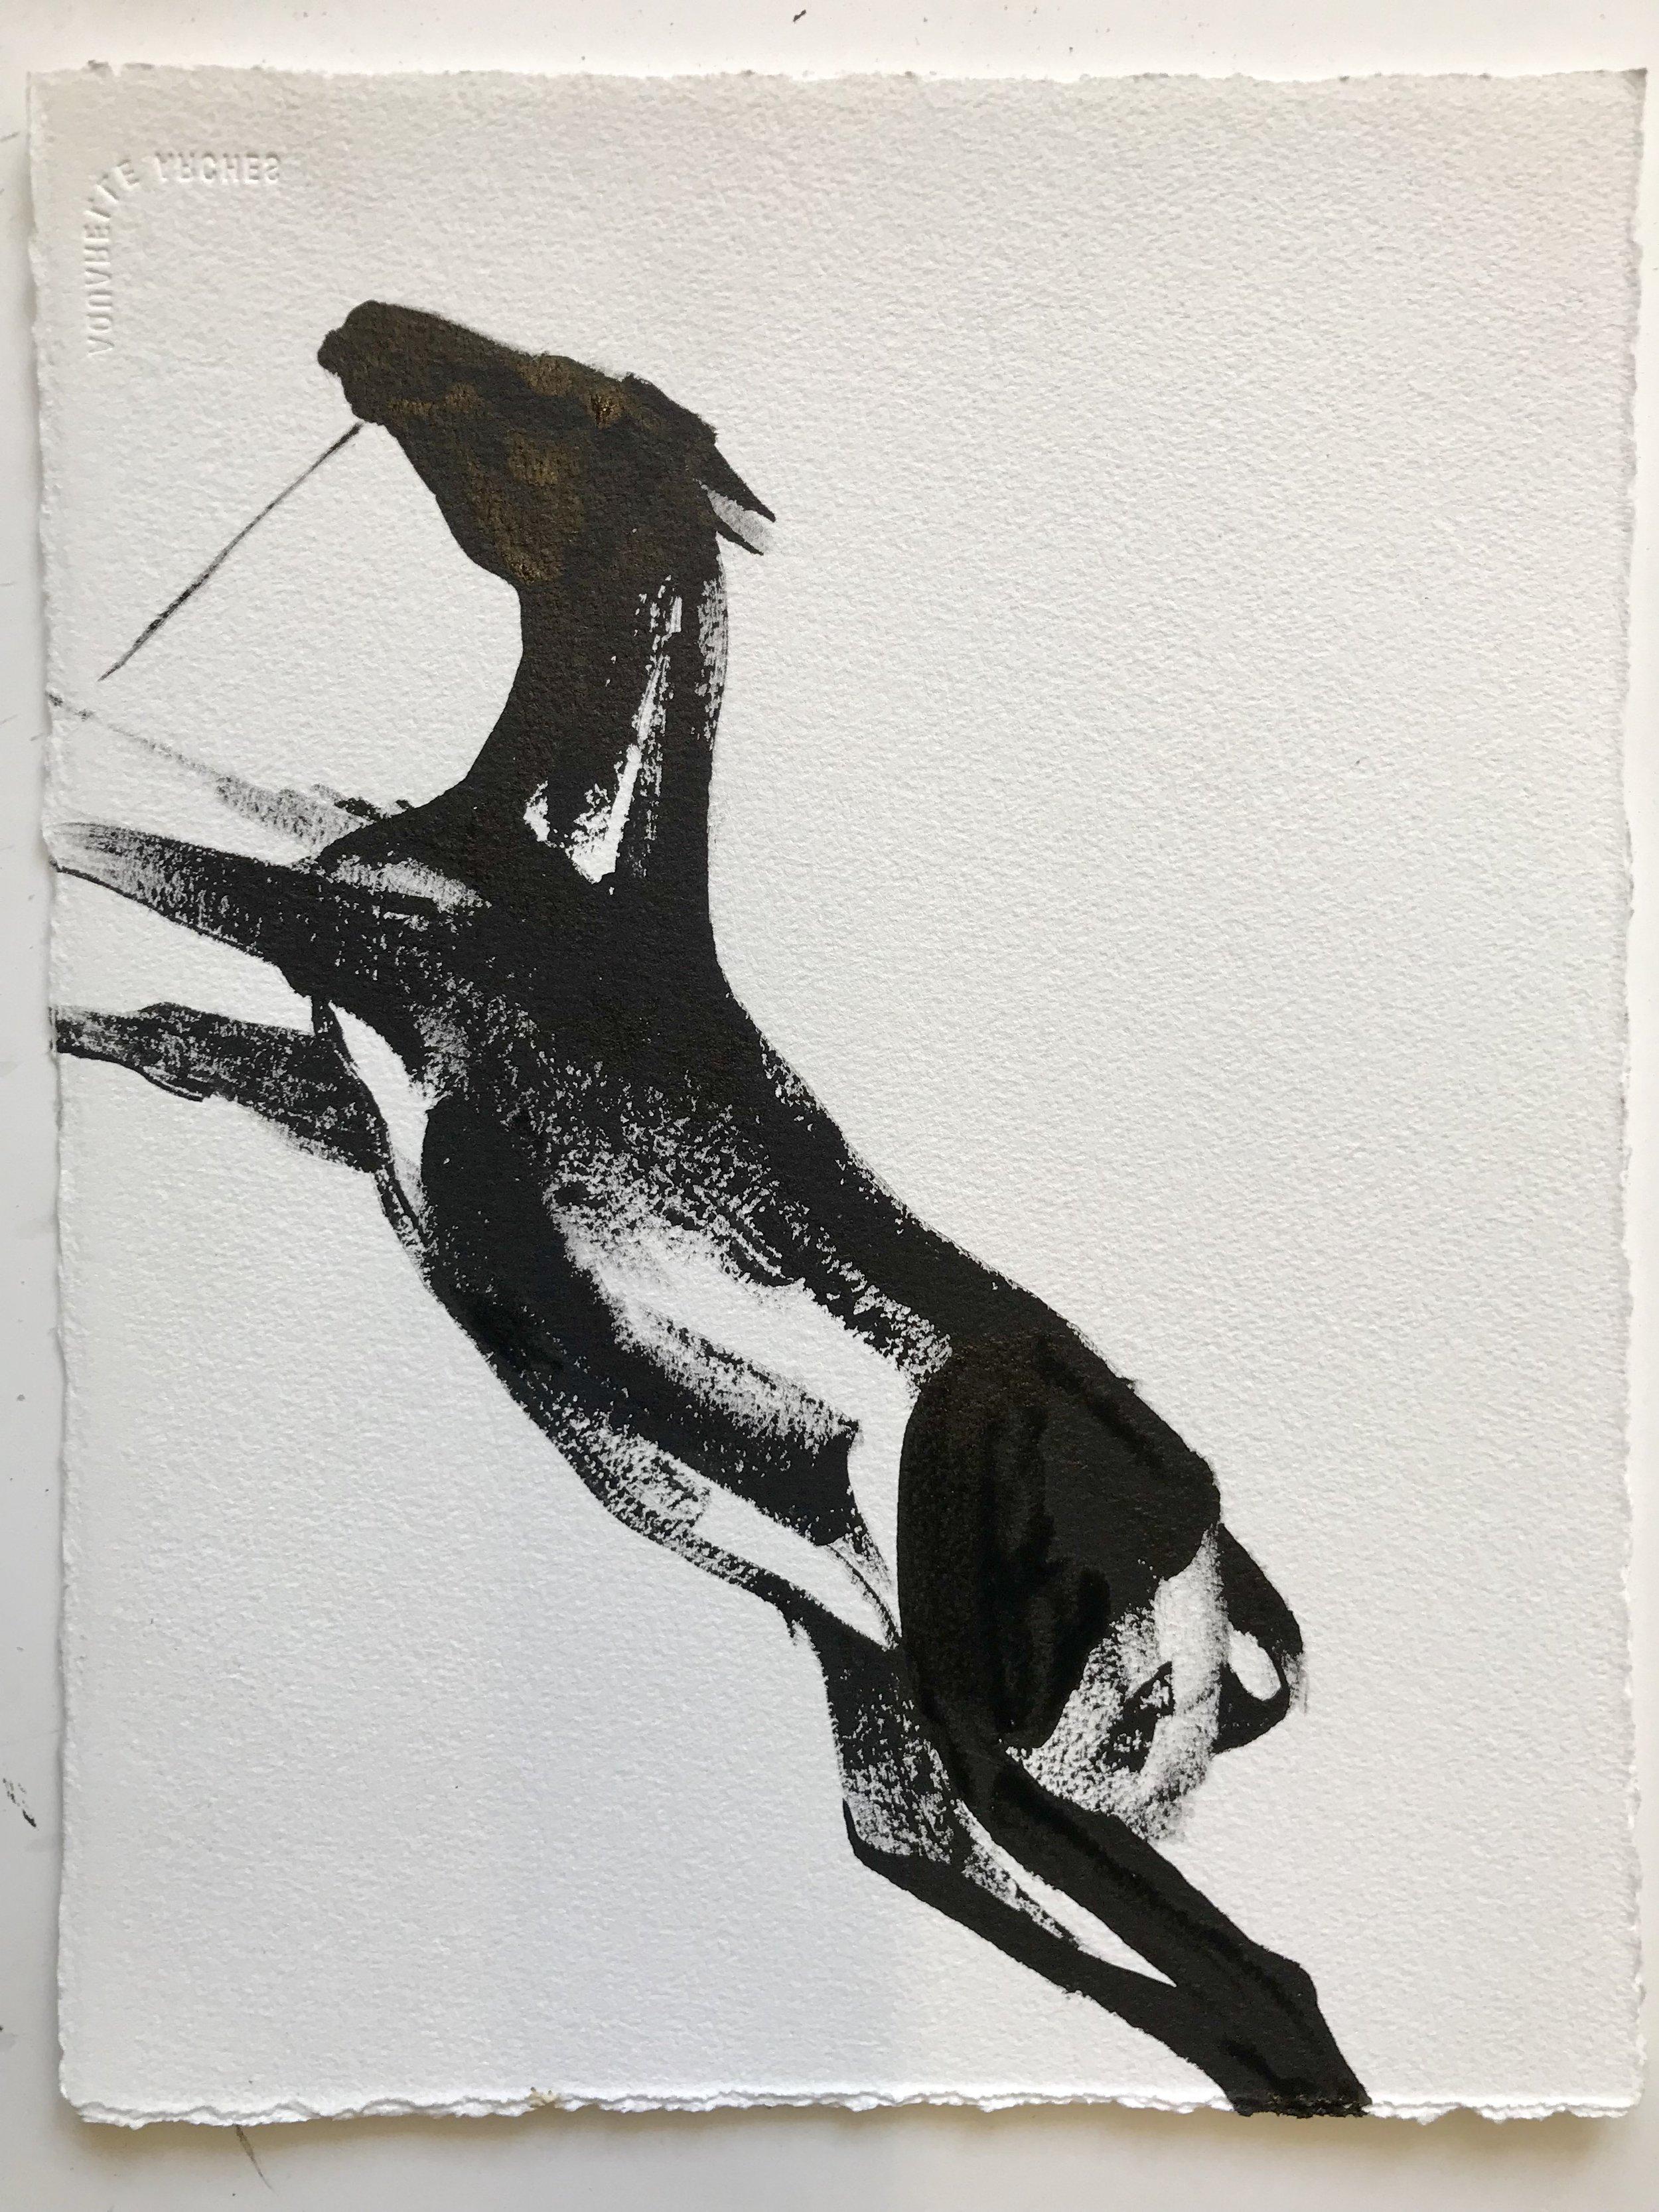 Animal study